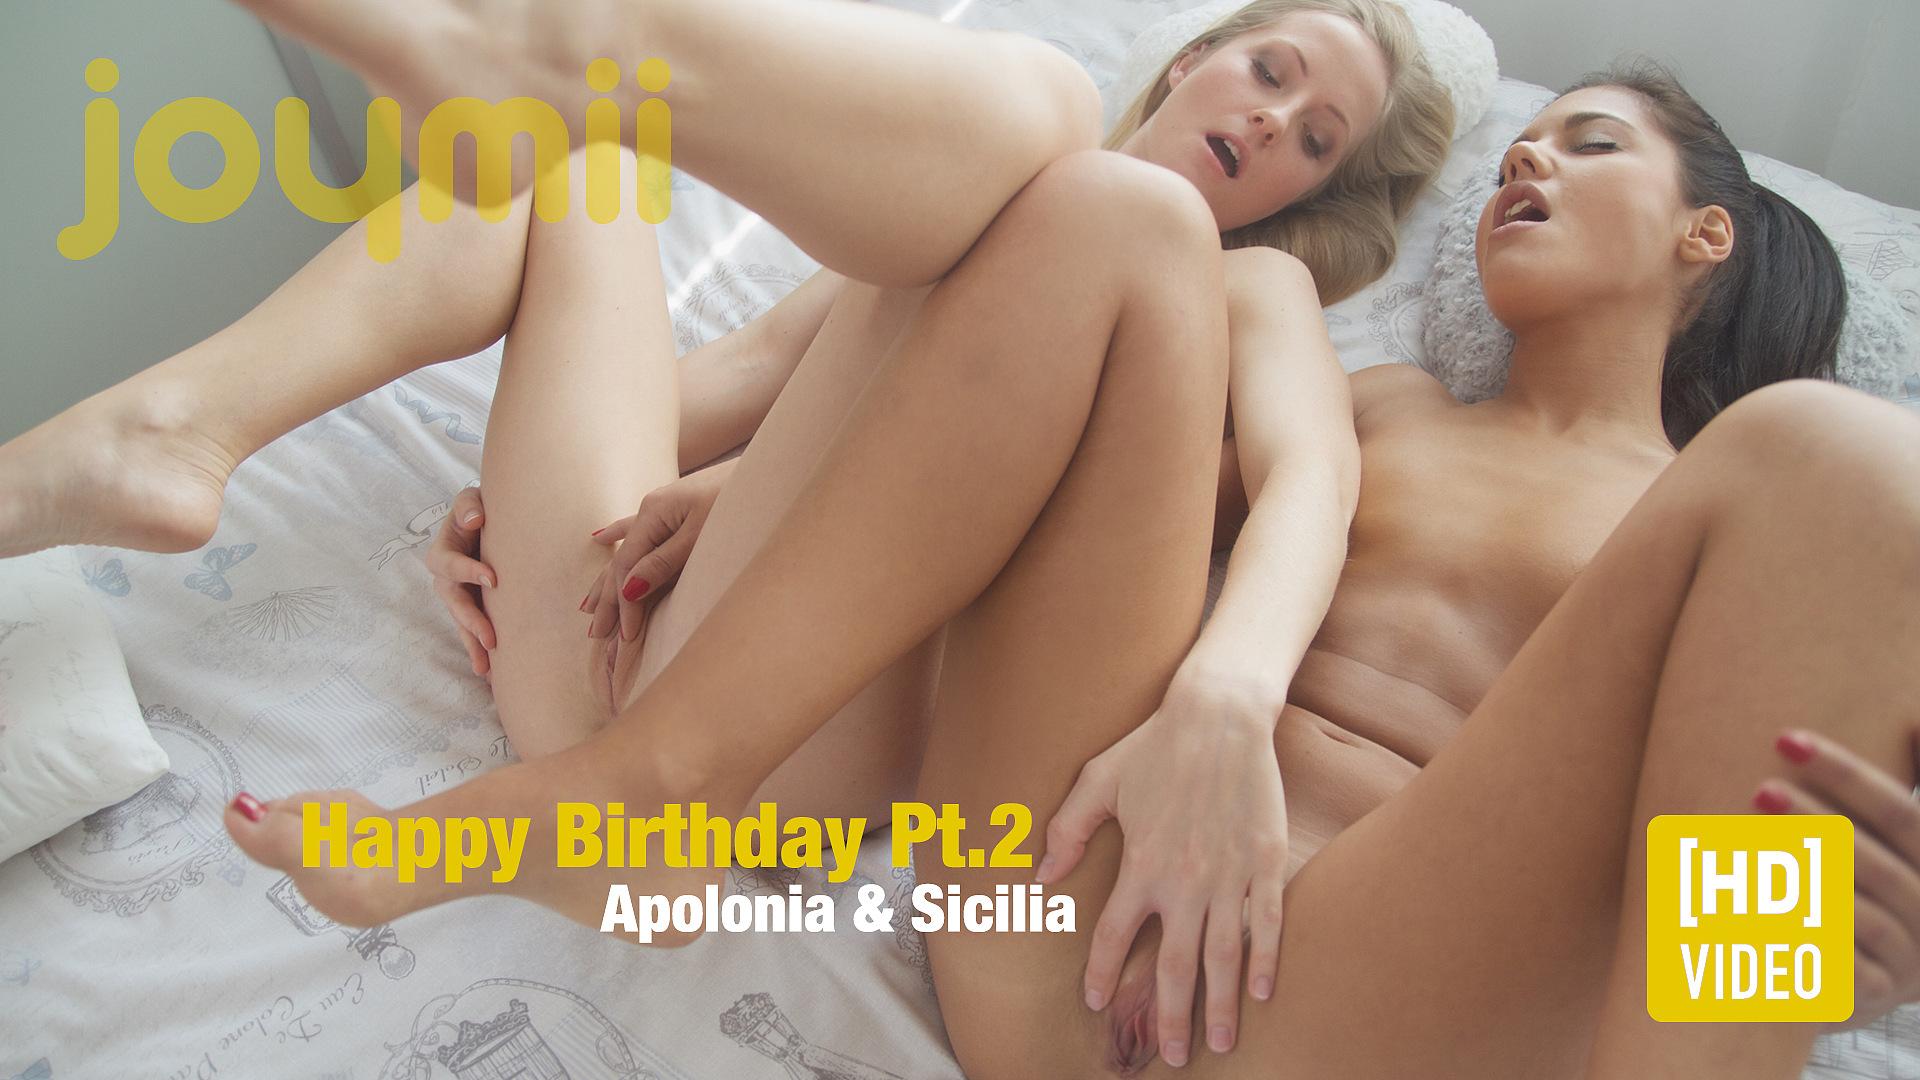 Happy Birthday Pt. 2